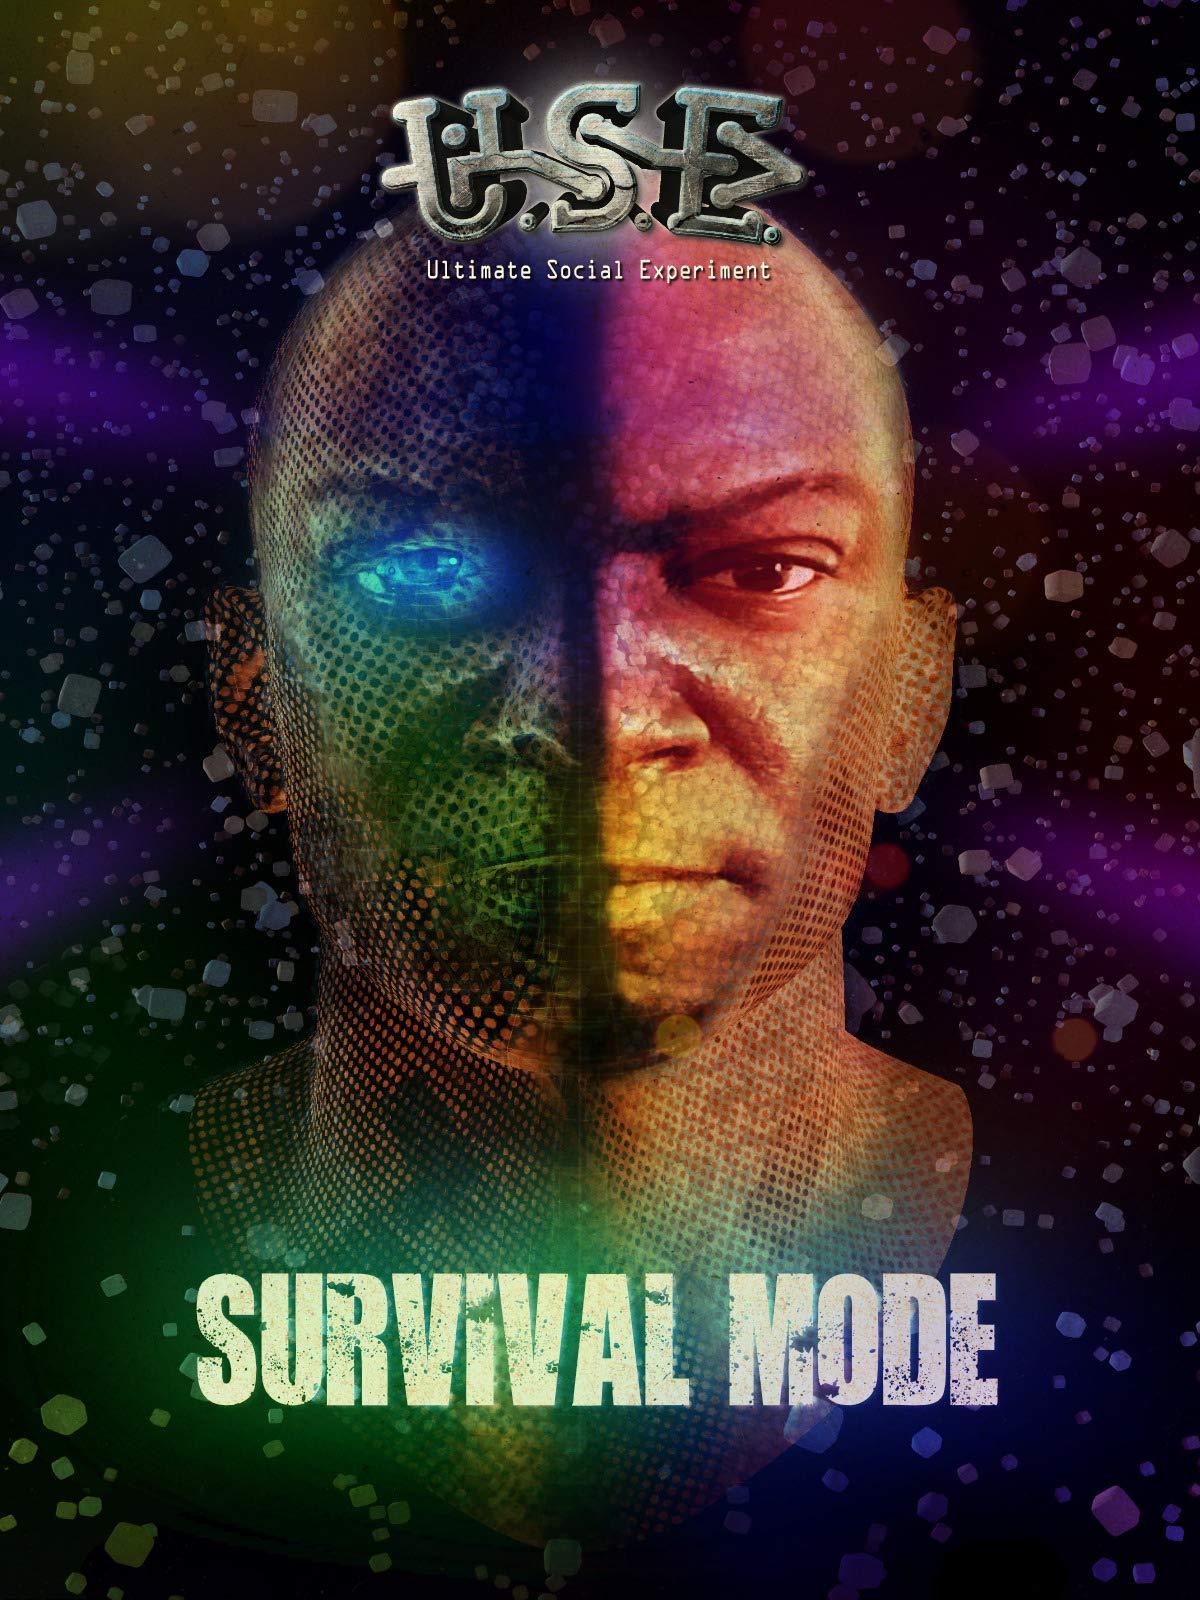 U.S.E. - Ultimate Social Experiment: Survival Mode